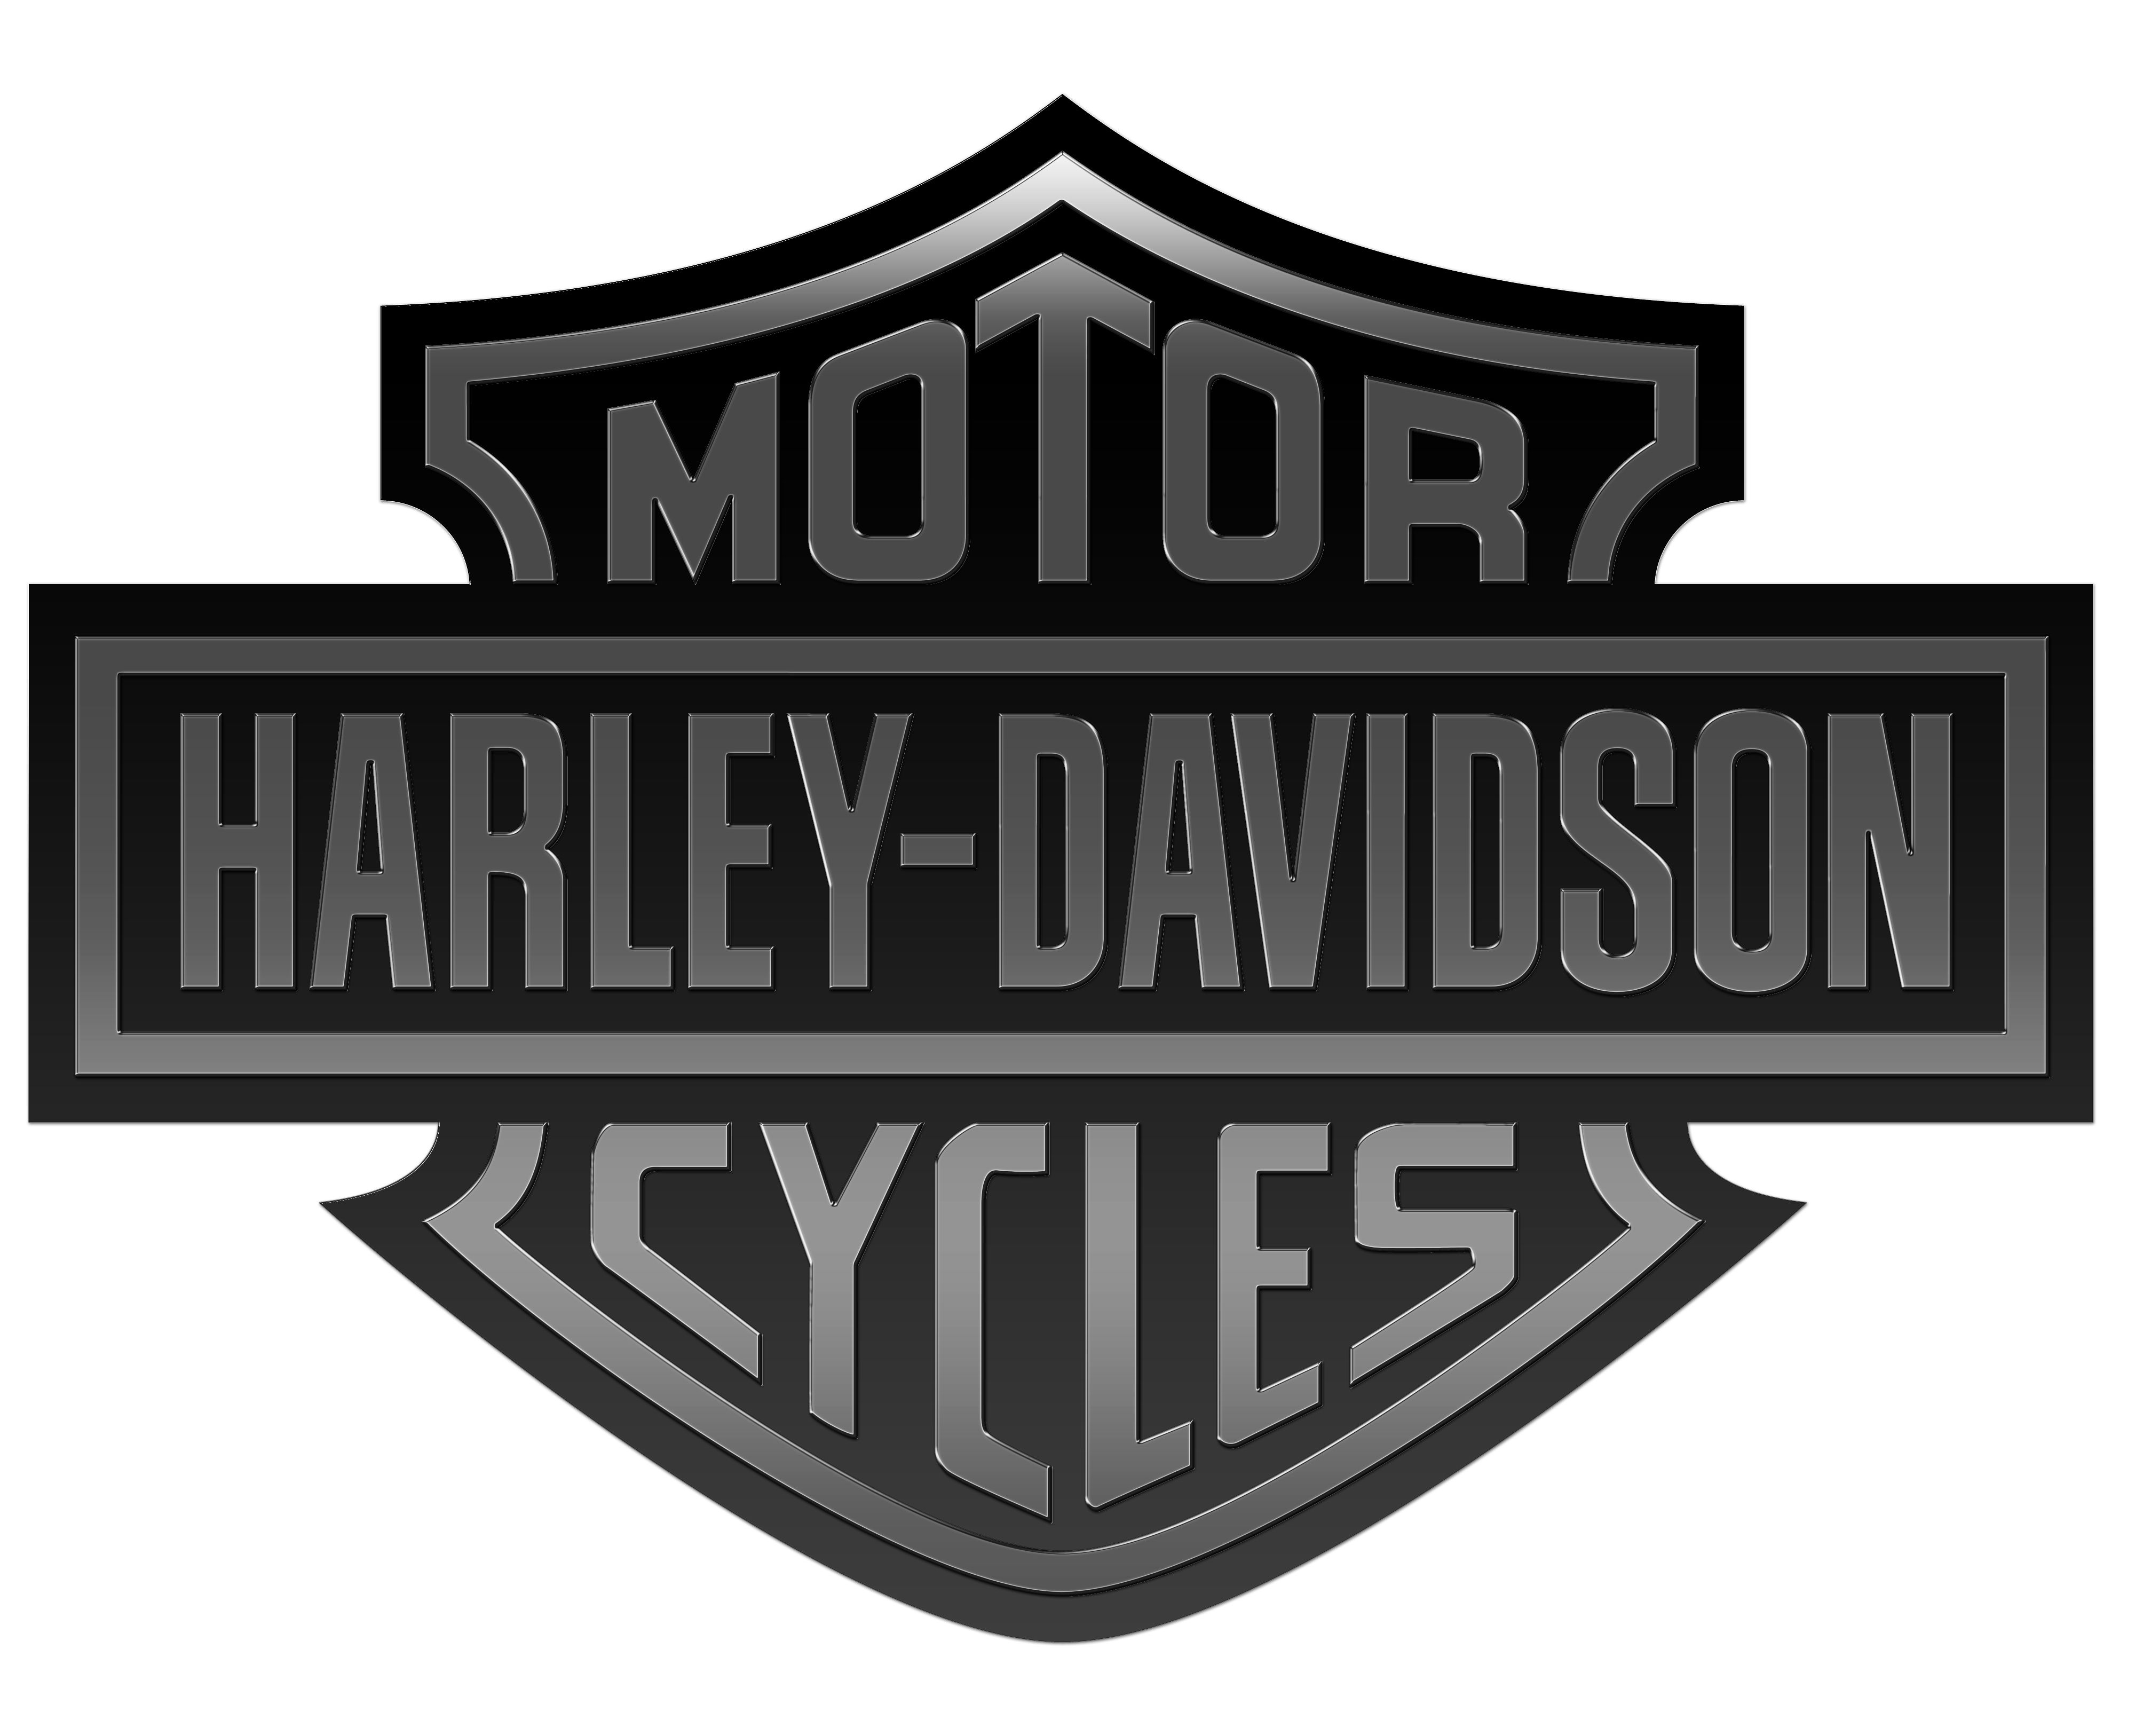 Harley Davidson Bar And Shield Logo Jpg 4 000 3 252 Pixels Harley Davidson Harley Vidrio Fundido